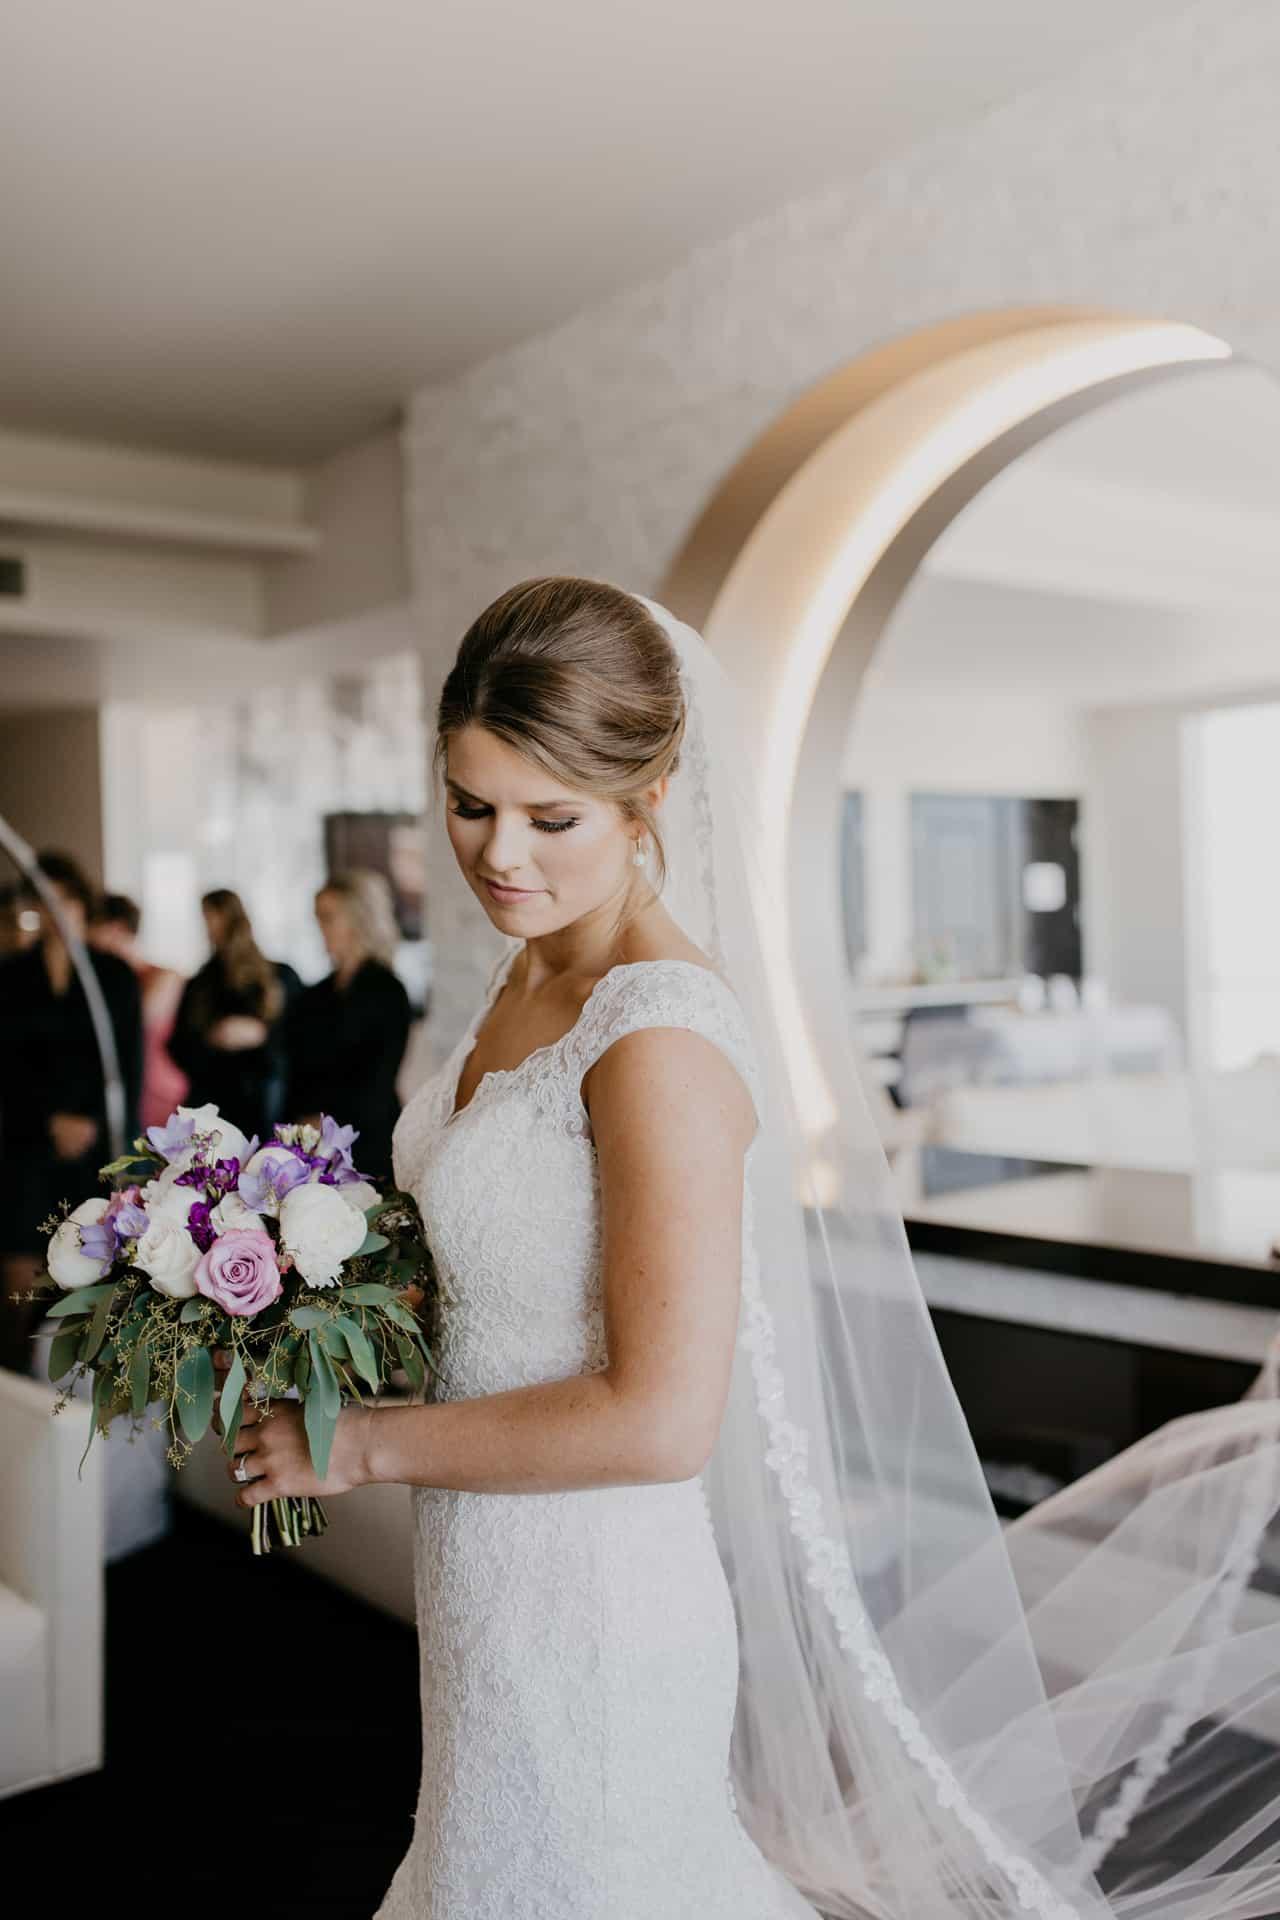 Bride holding flowers at Davenport Grand